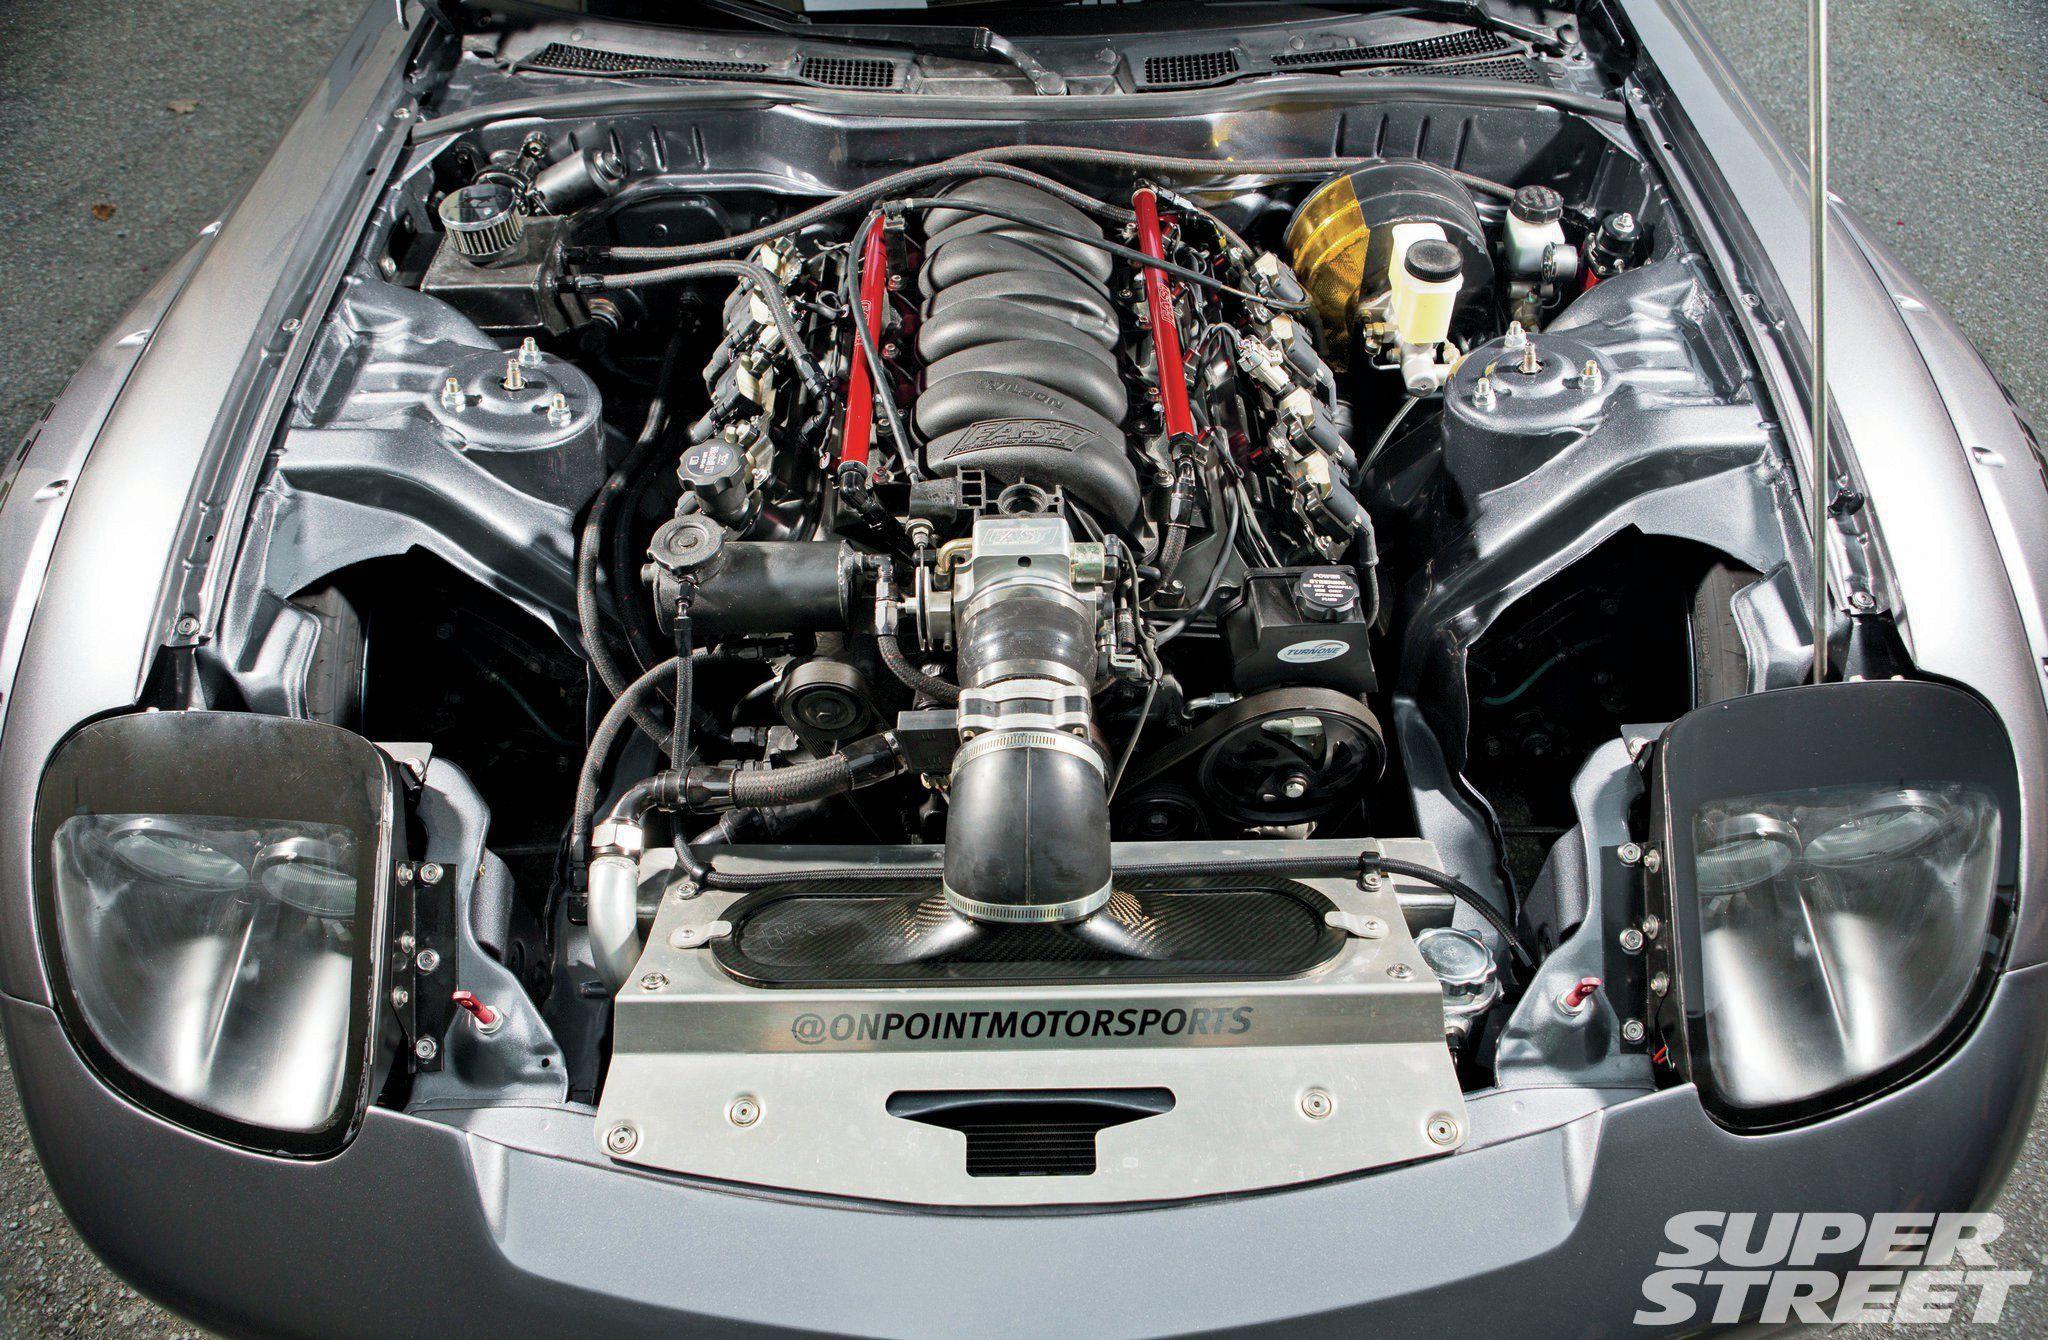 hight resolution of 1993 mazda rx7 gm ls1 engine 06